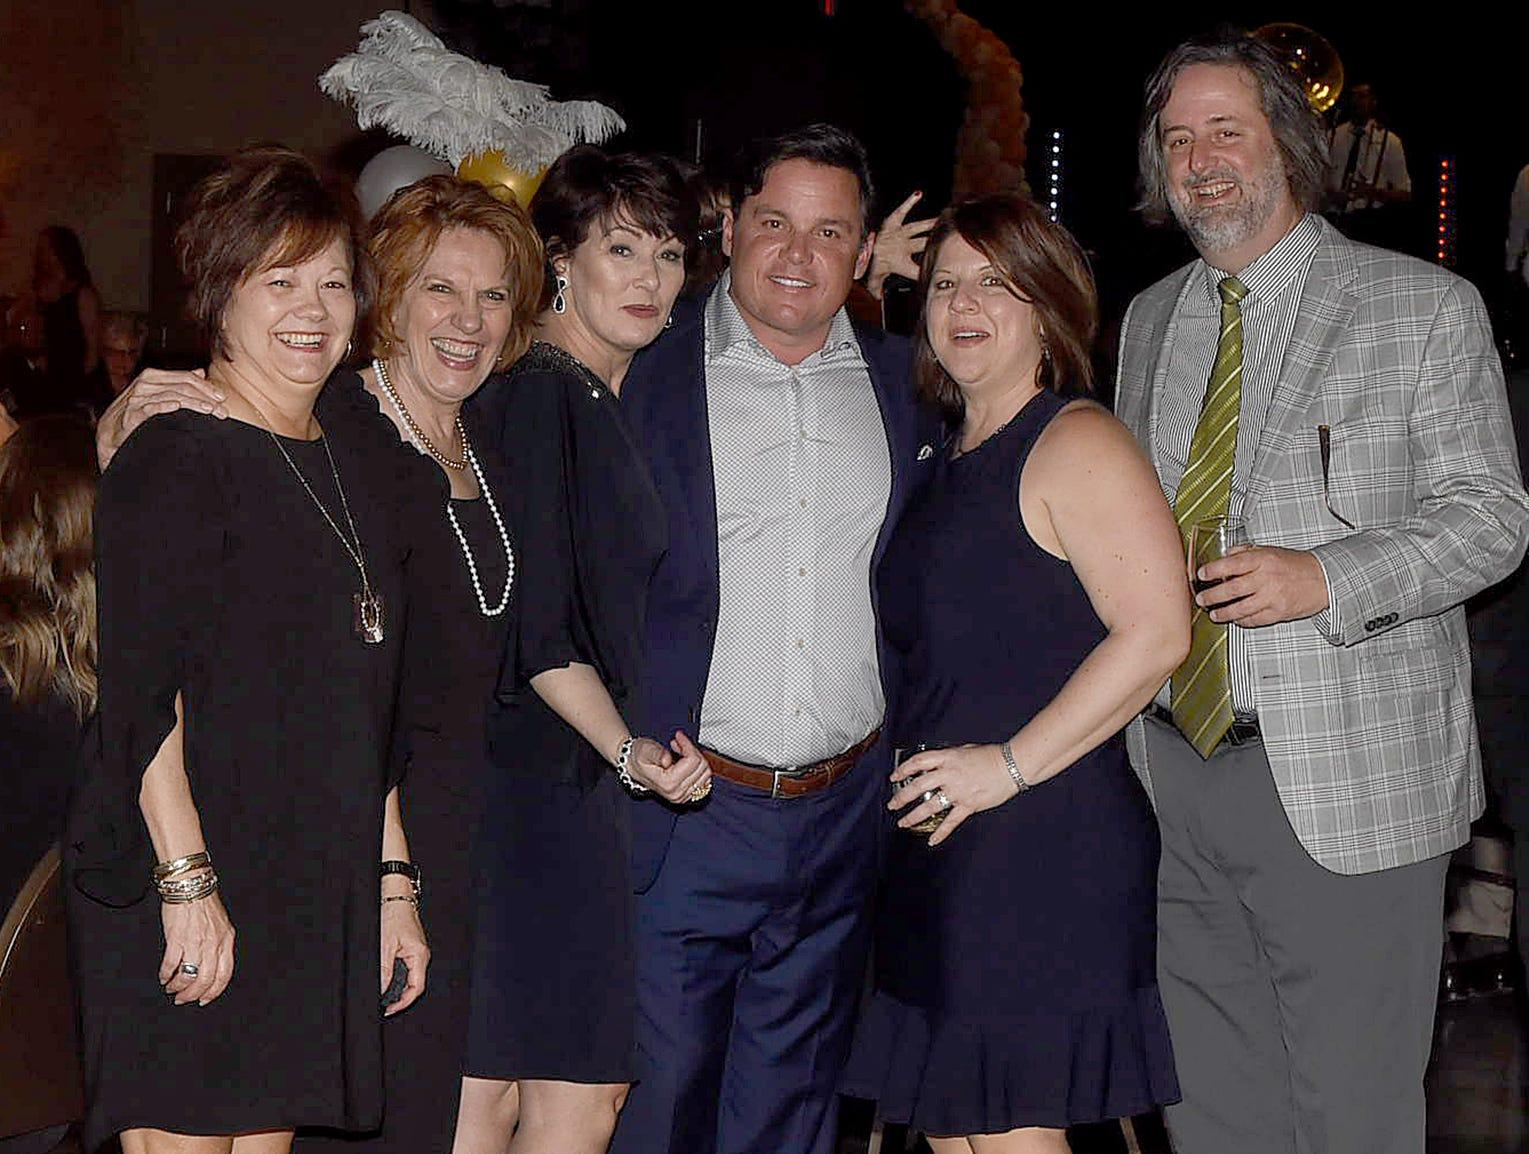 St. Landry Chamber of Commerce Gala